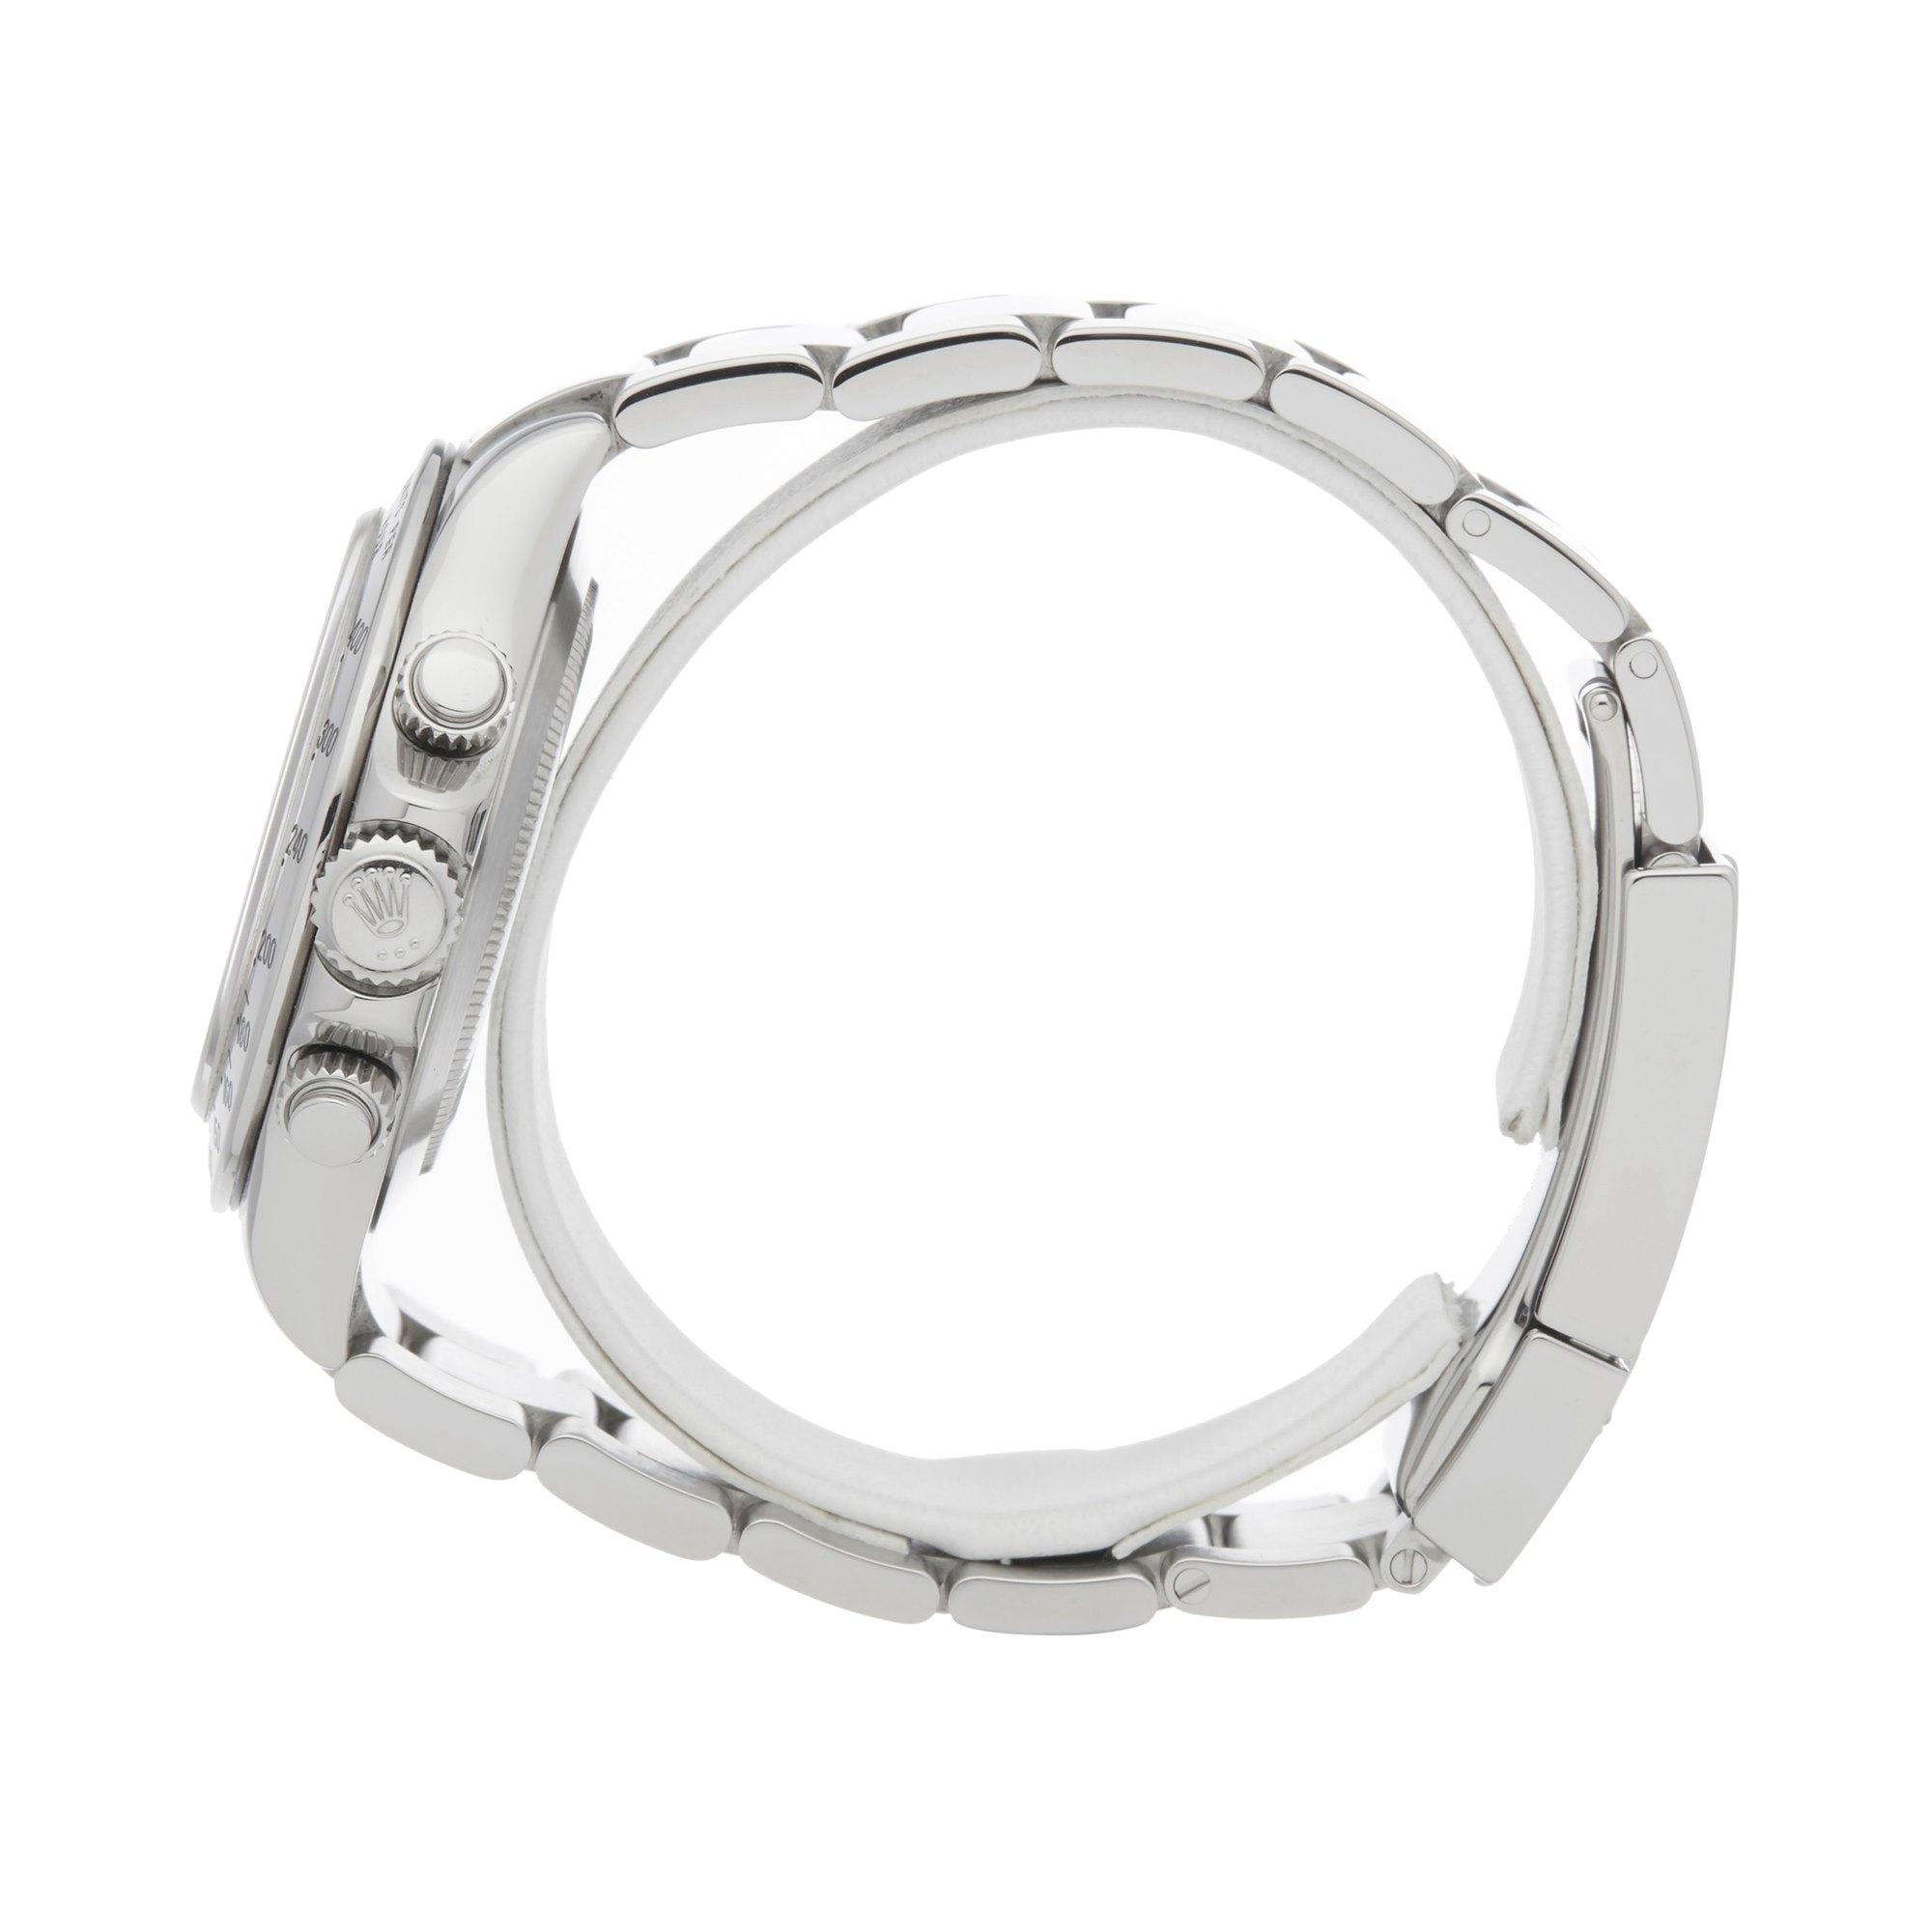 Rolex Daytona Chronograph Stainless Steel 116520